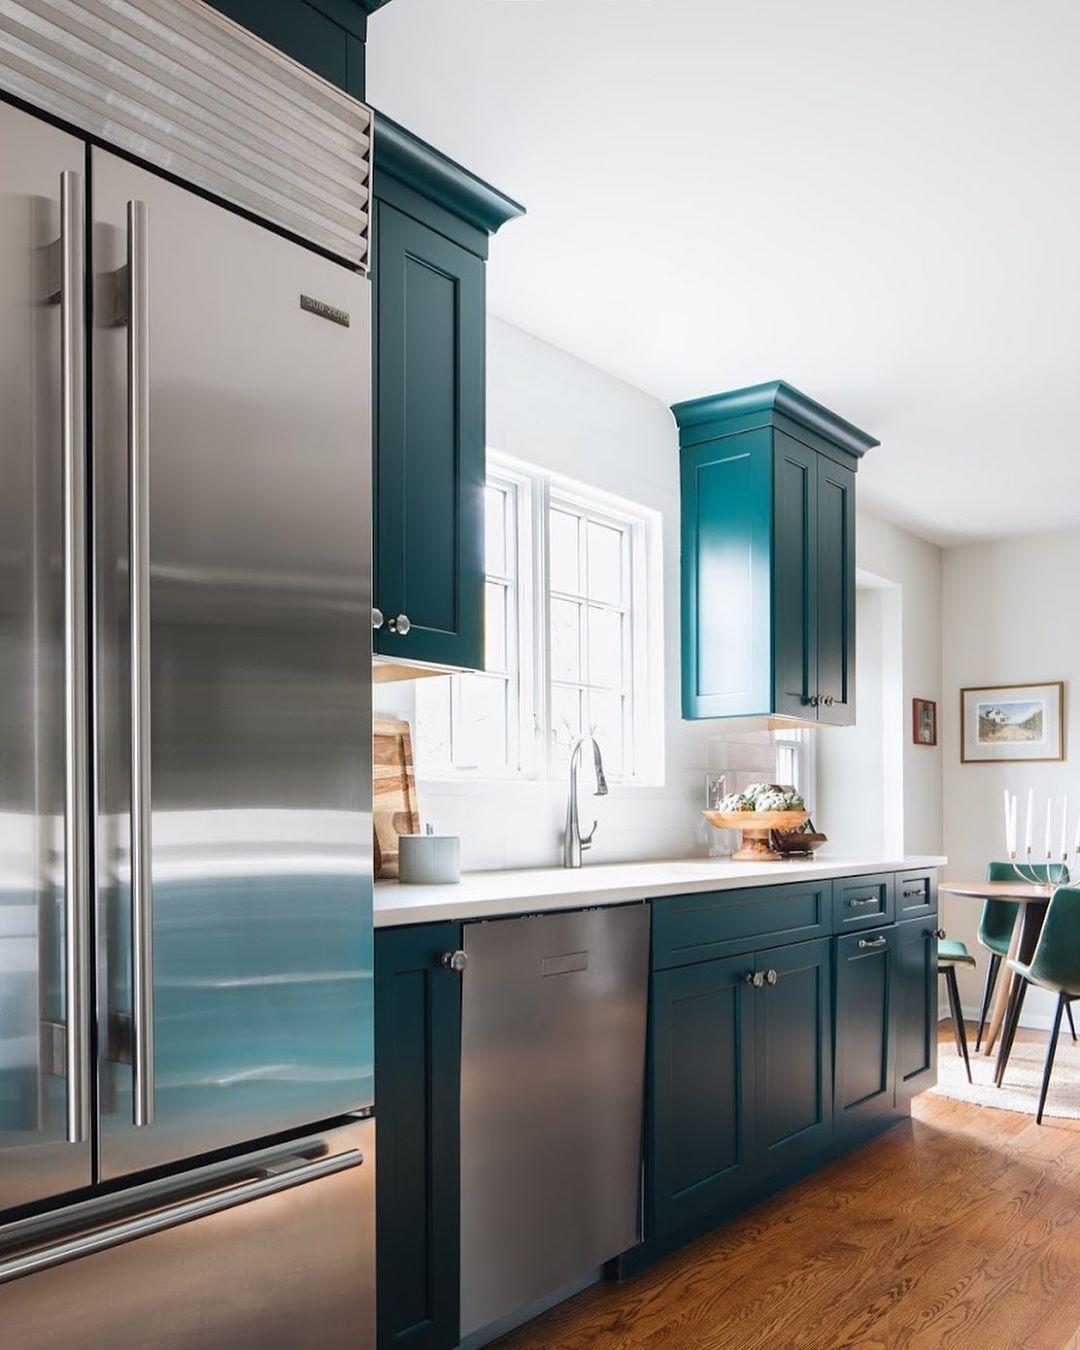 Aqua colored kitchen